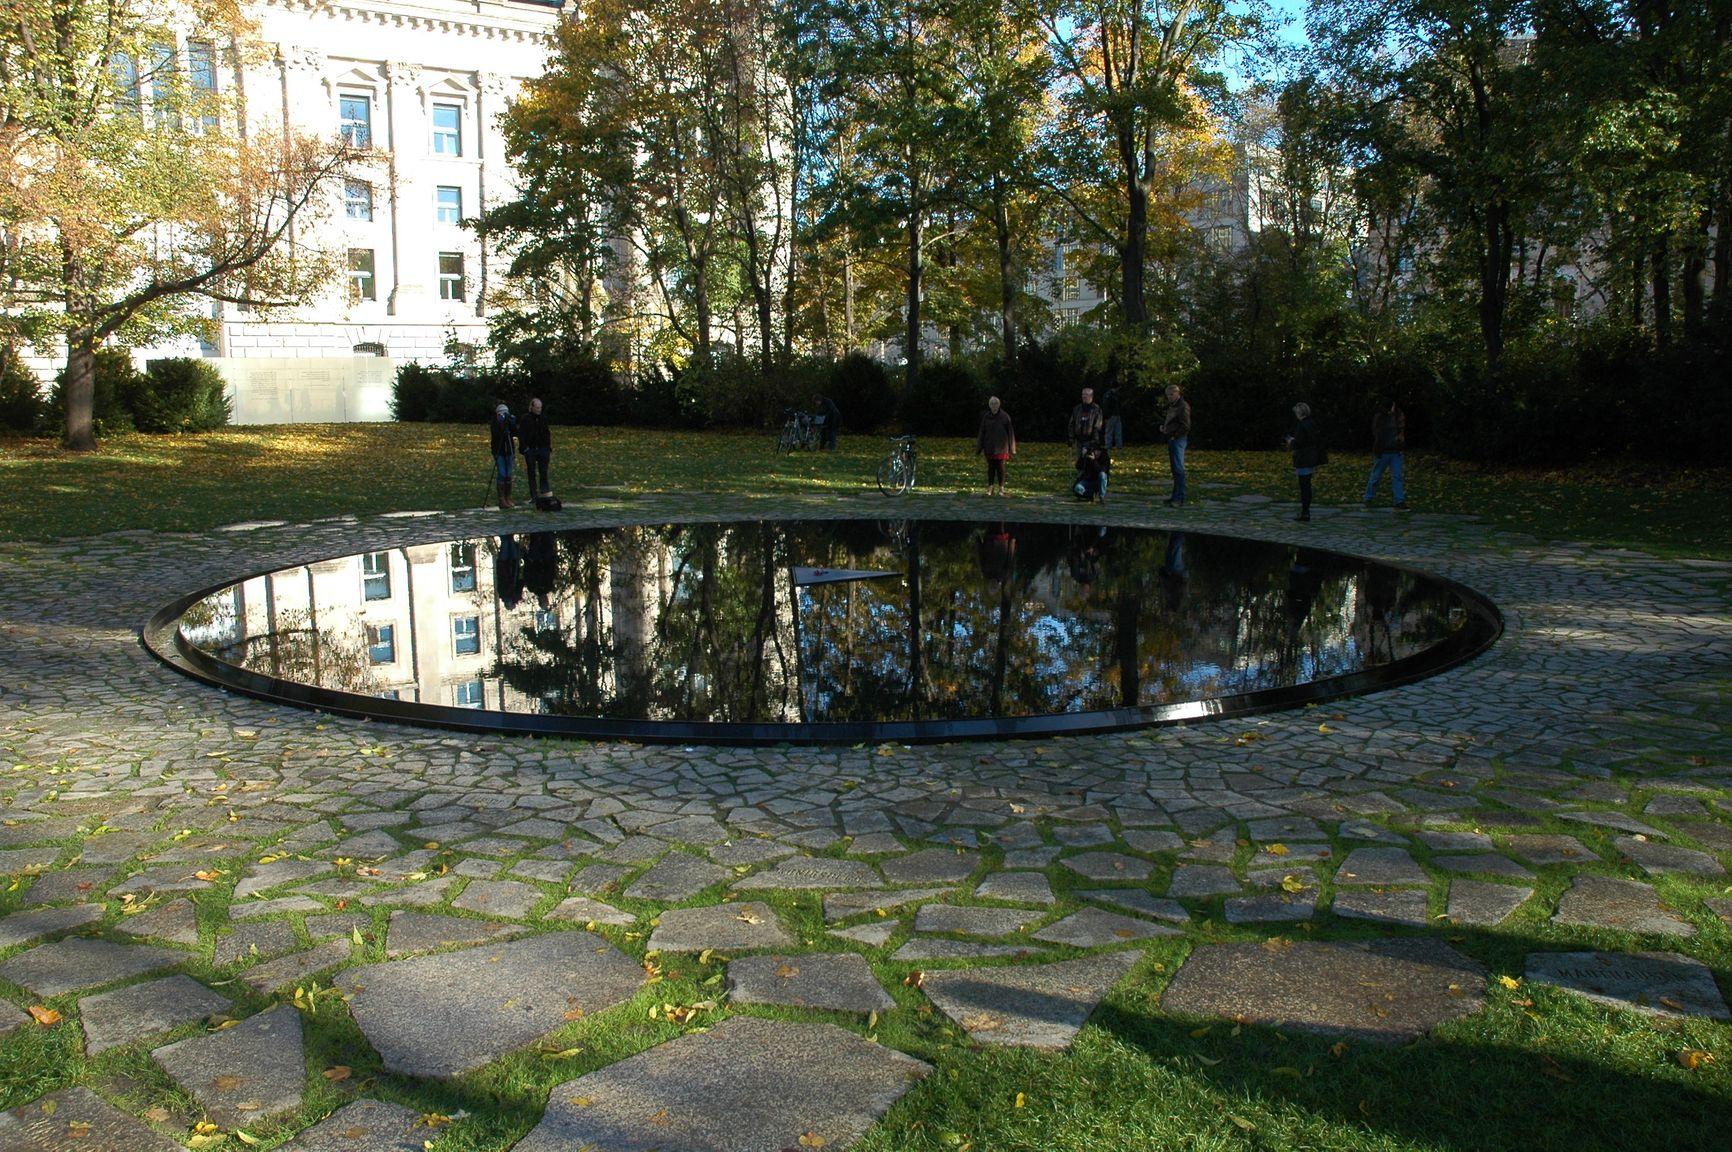 Берлин. Мемориал памяти народов синти и рома